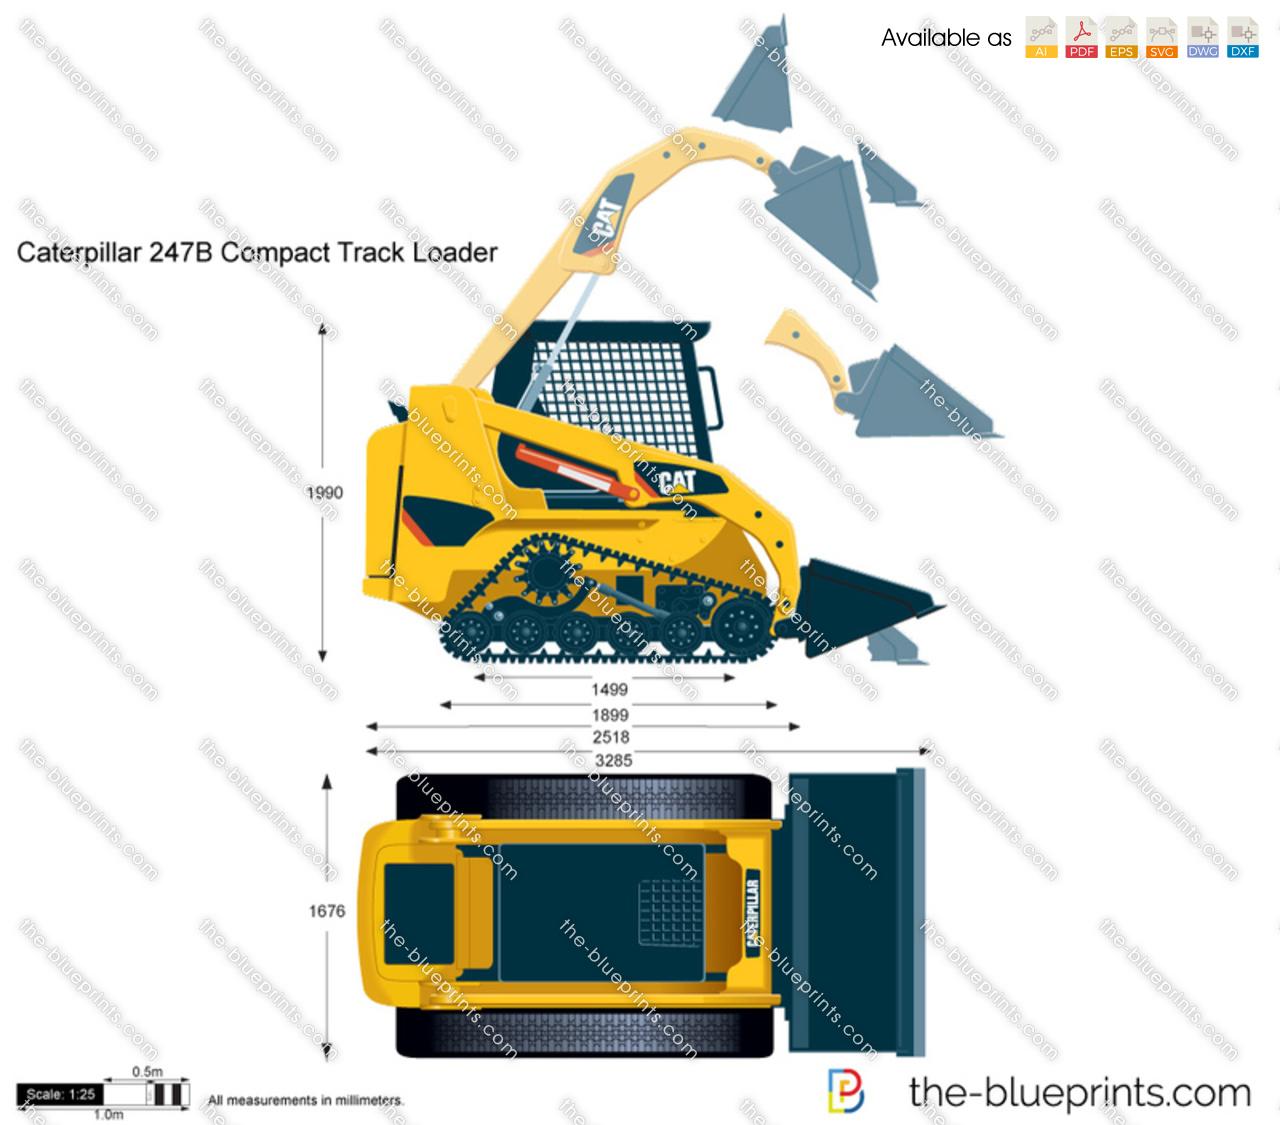 Caterpillar 247B Compact Track Loader